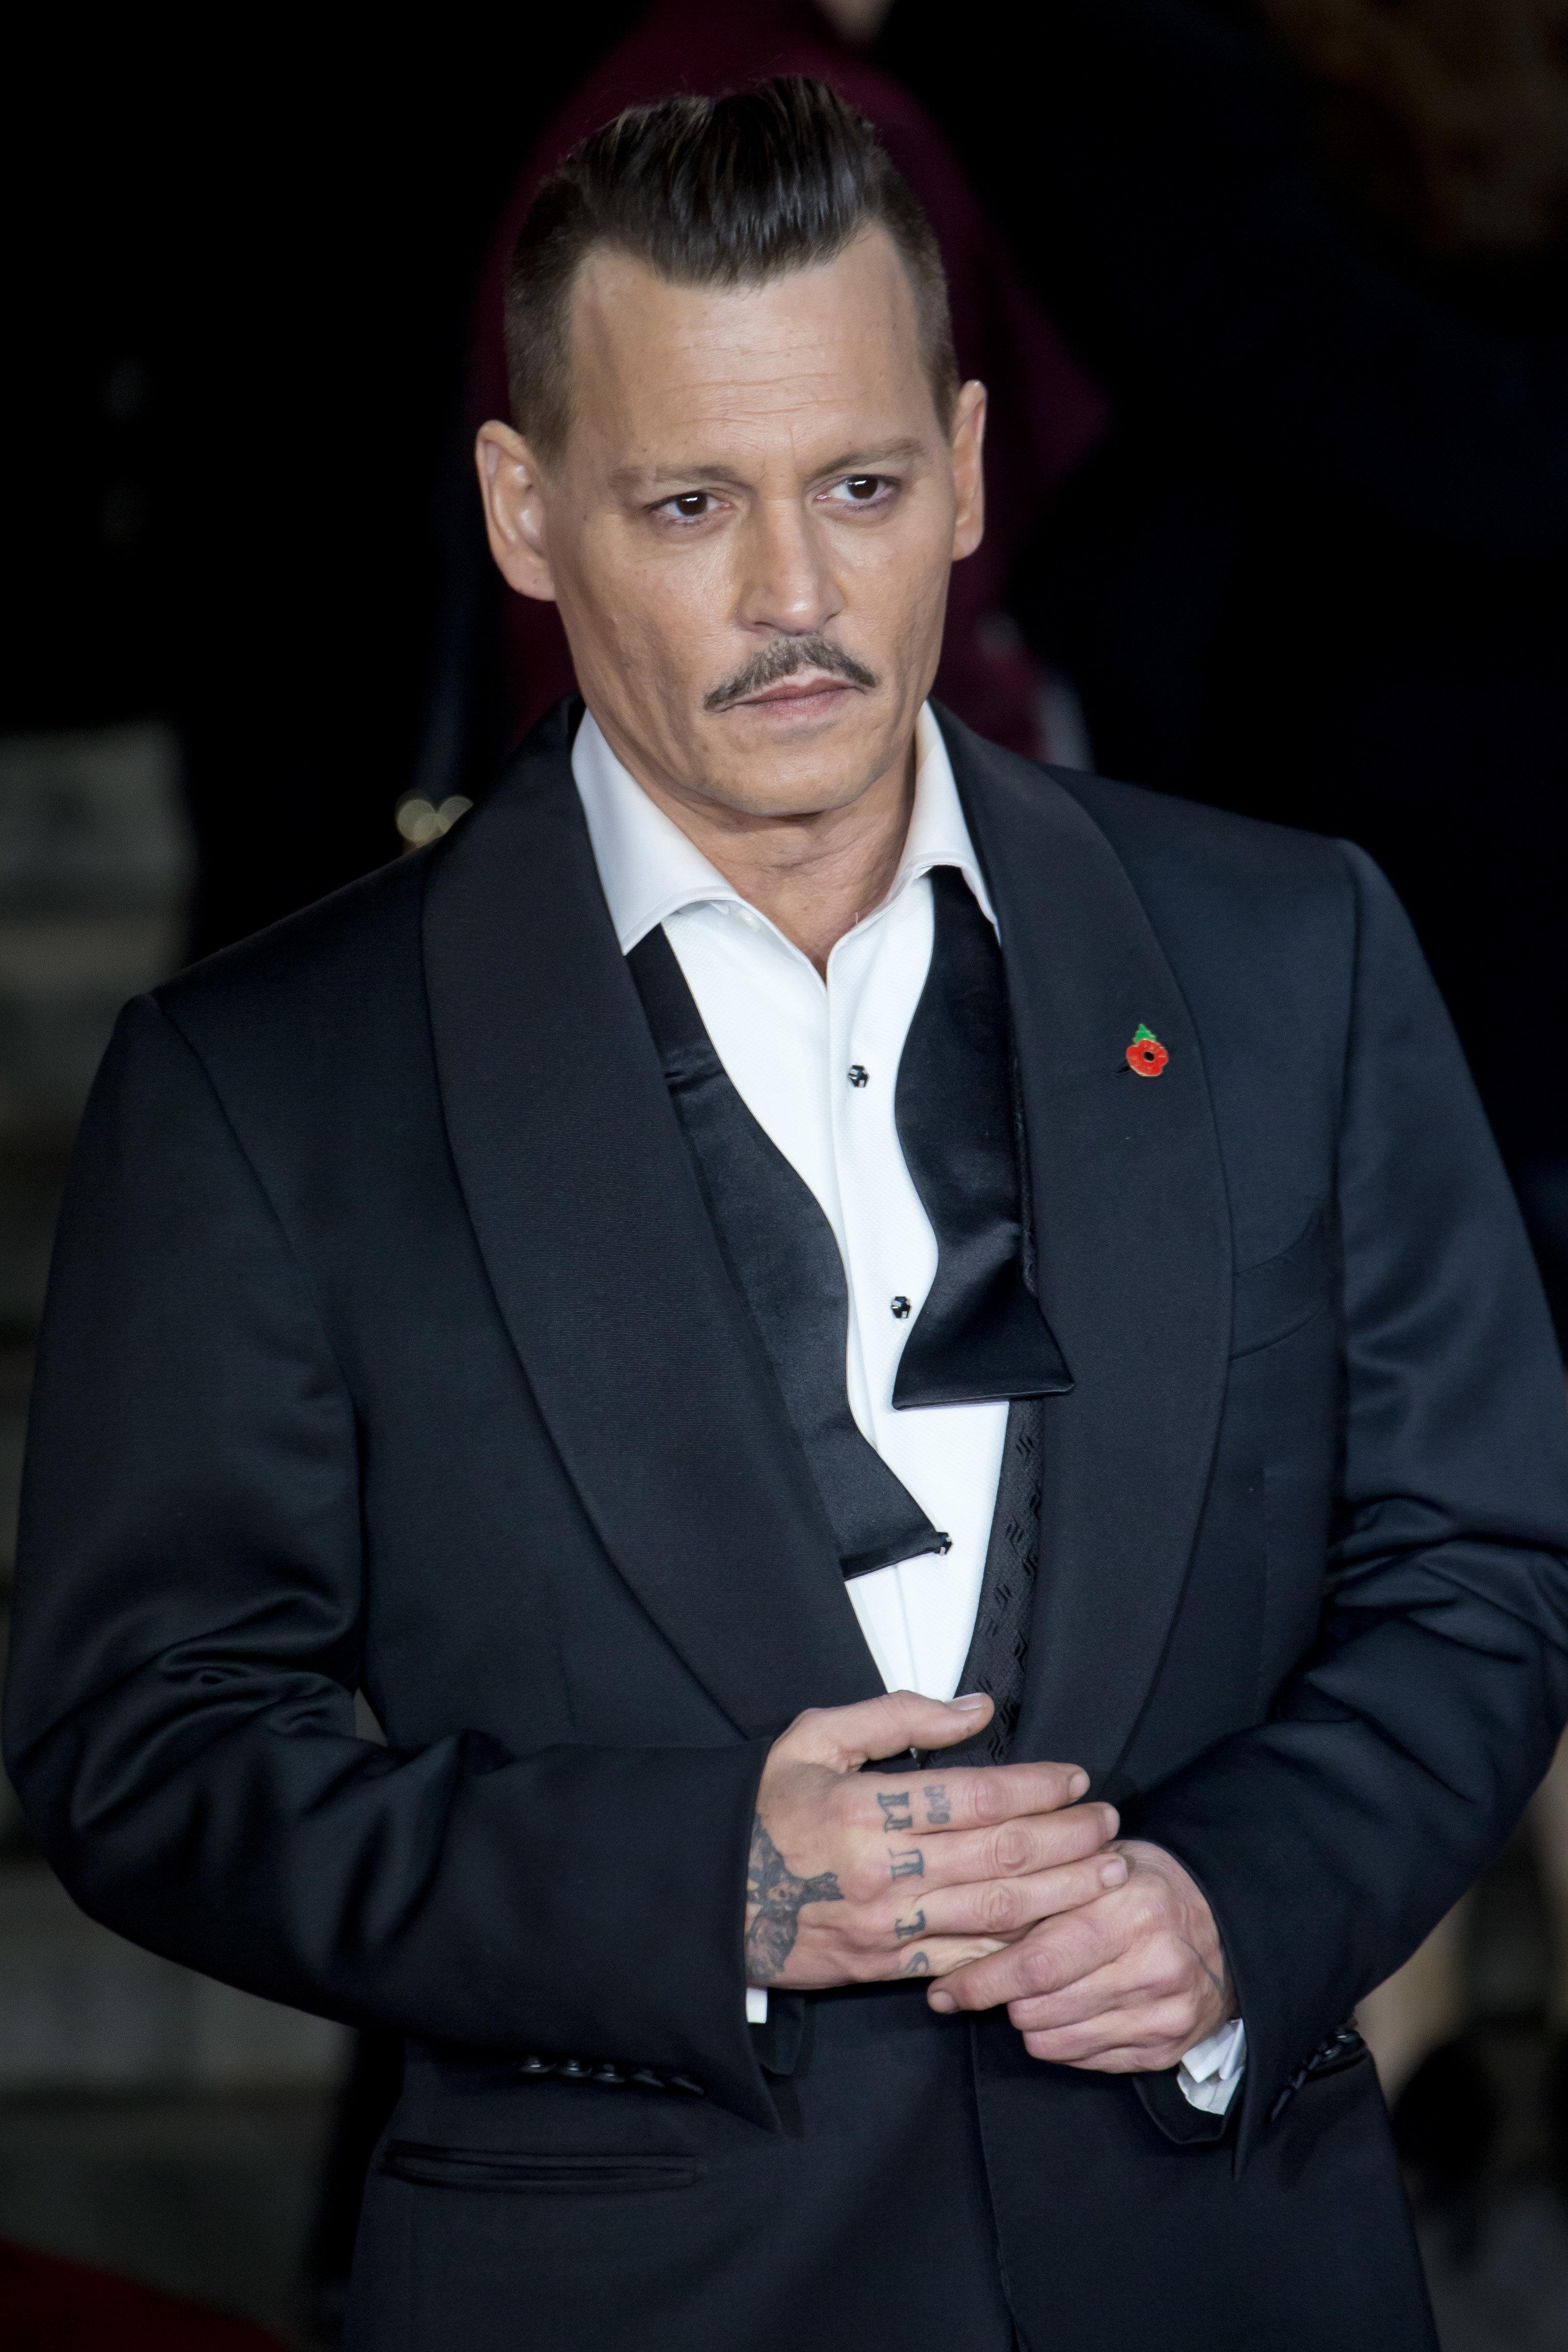 Johnny no good: Καταγγελίες για χρωστούμενα και για «χαοτική» συμπεριφορά από τους πρώην σωματοφύλακές